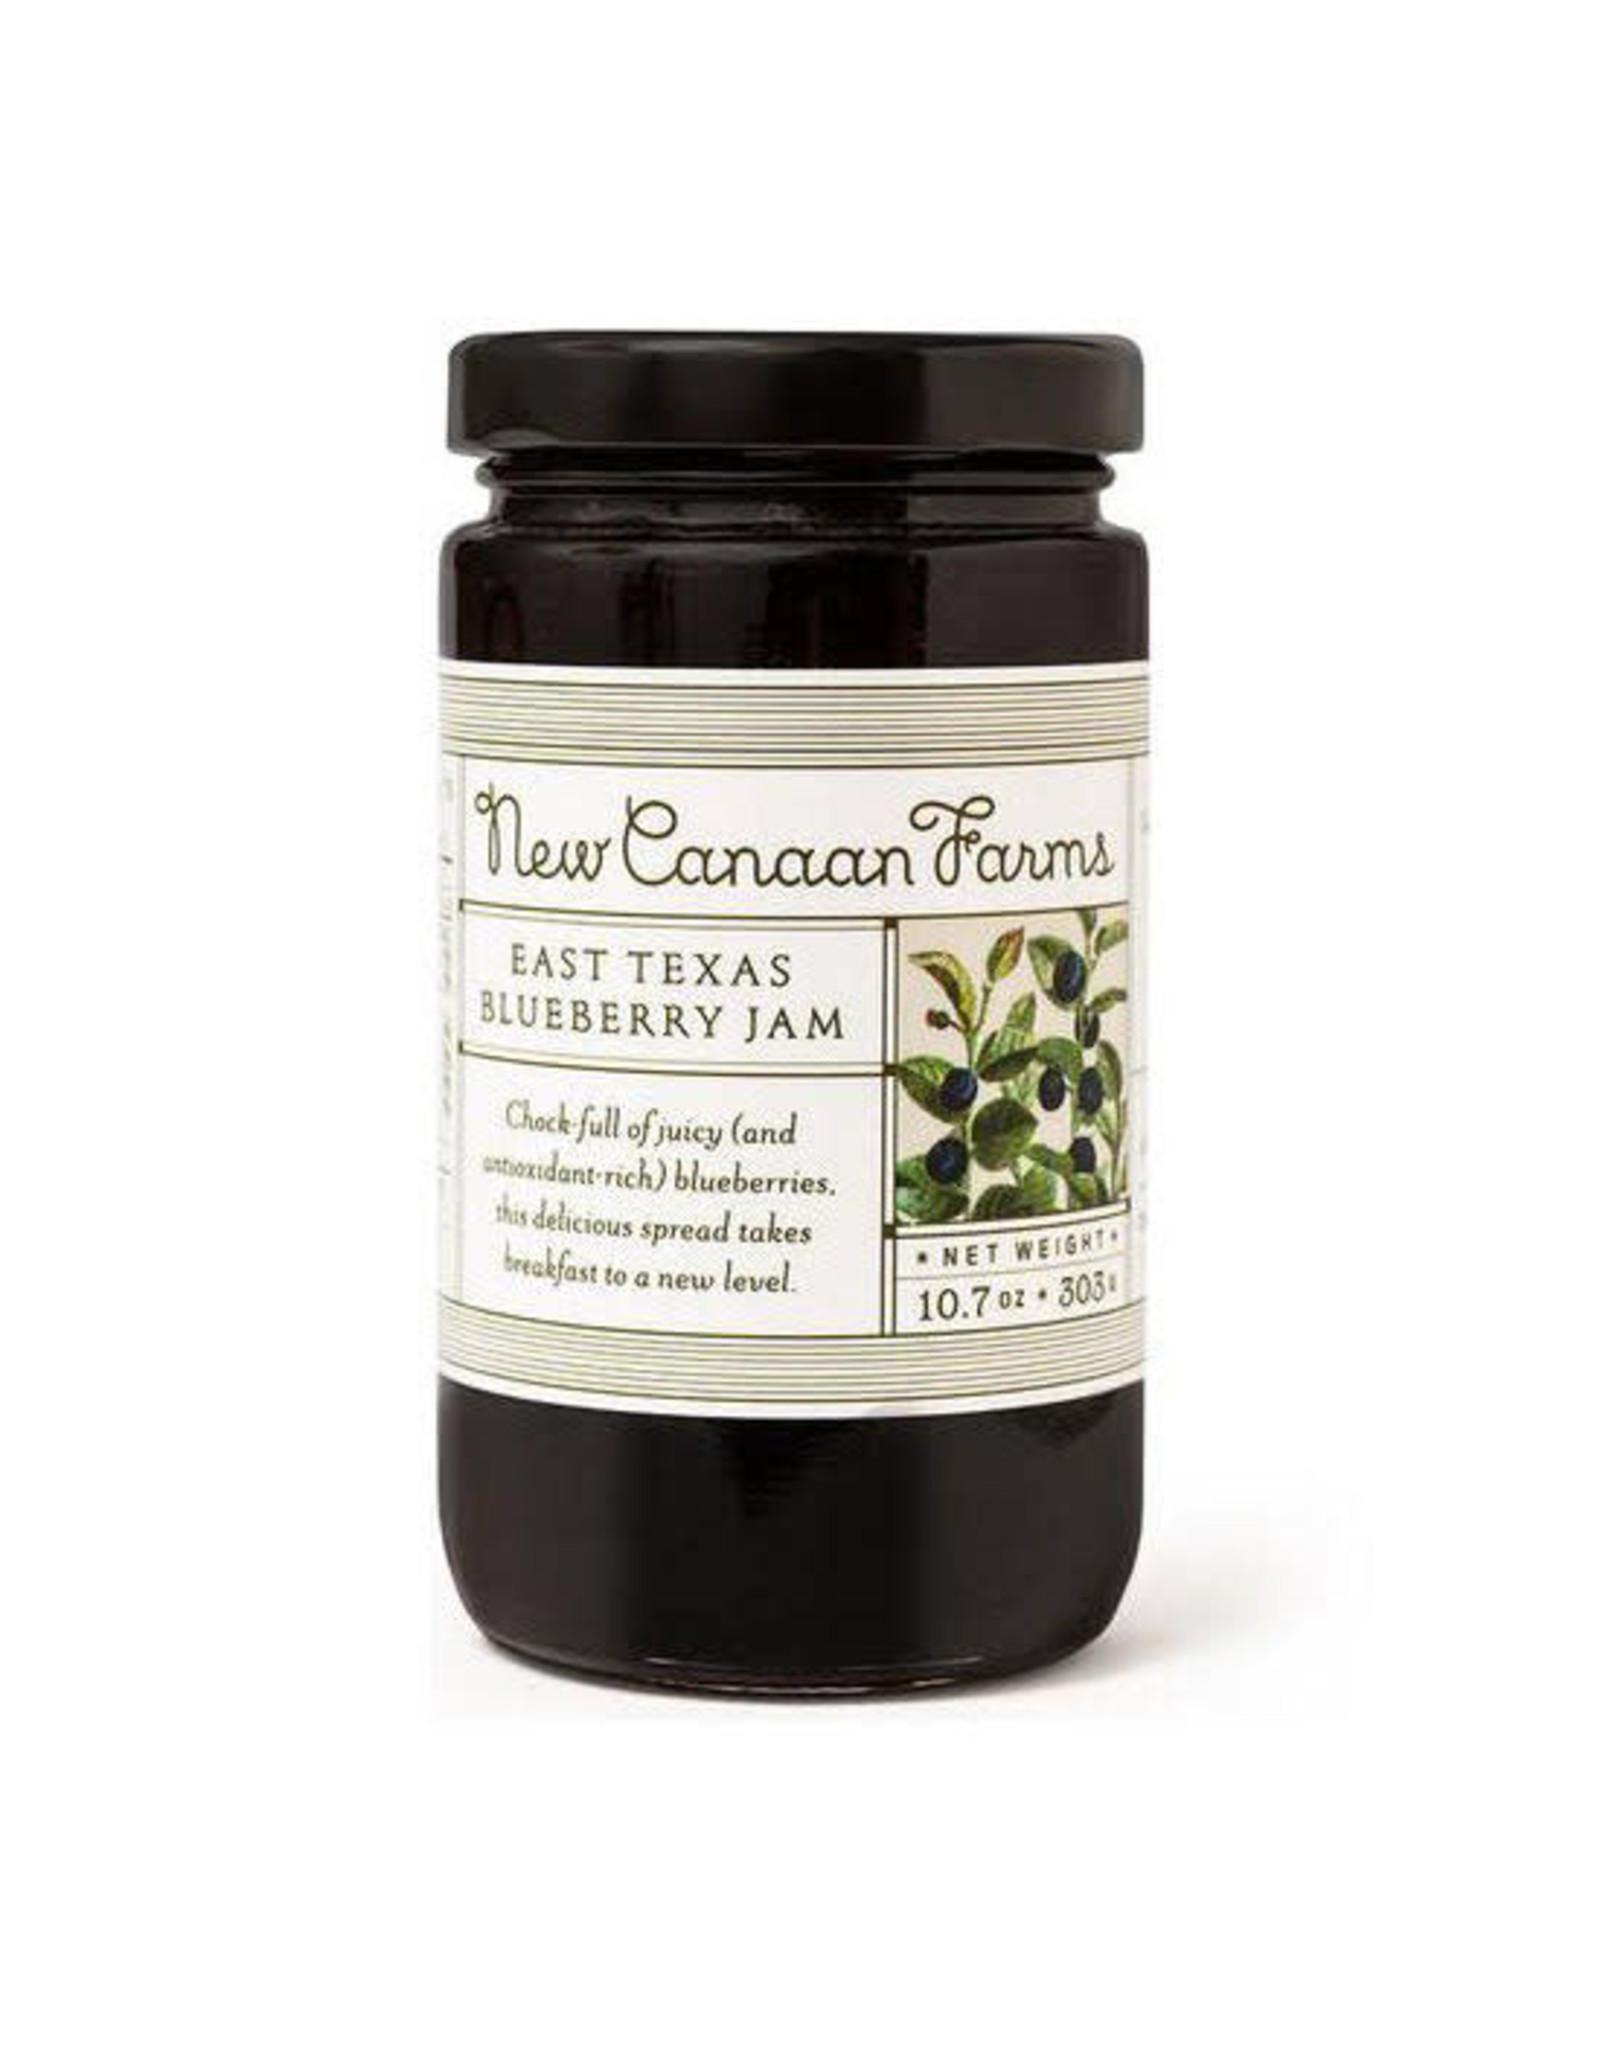 East Texas Blueberry Jam